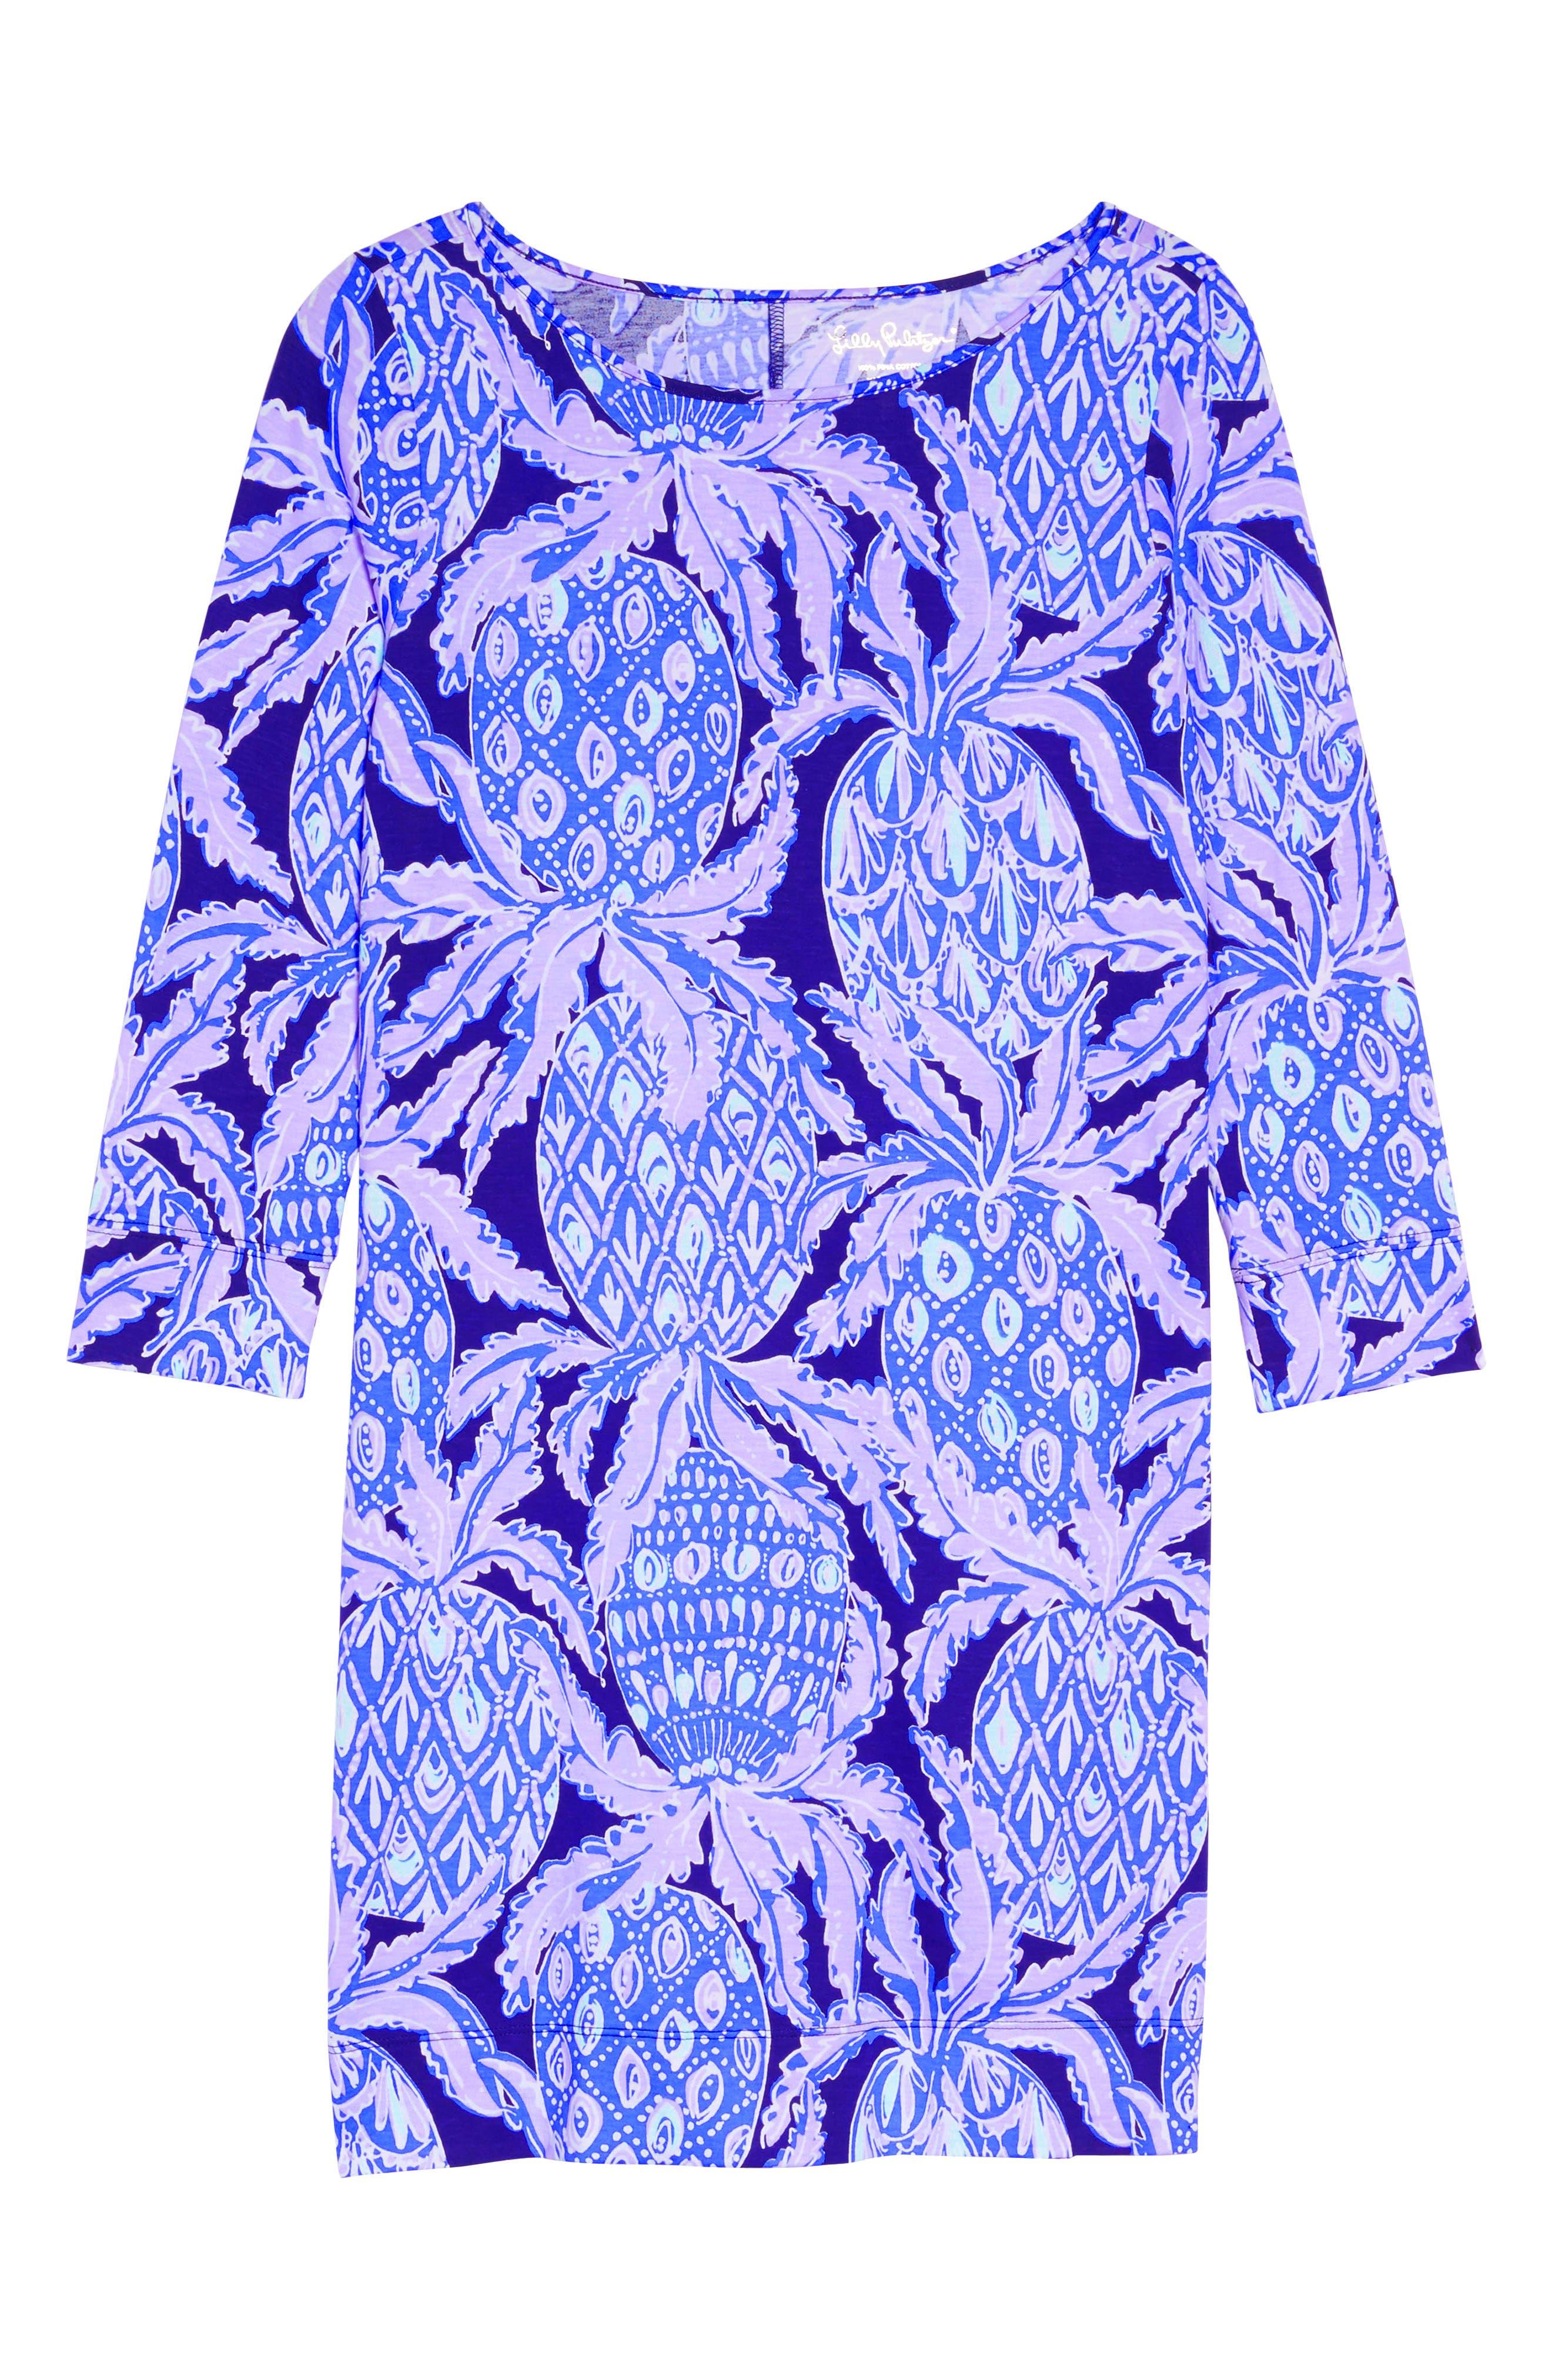 Marlowe Shift Dress,                             Alternate thumbnail 7, color,                             550